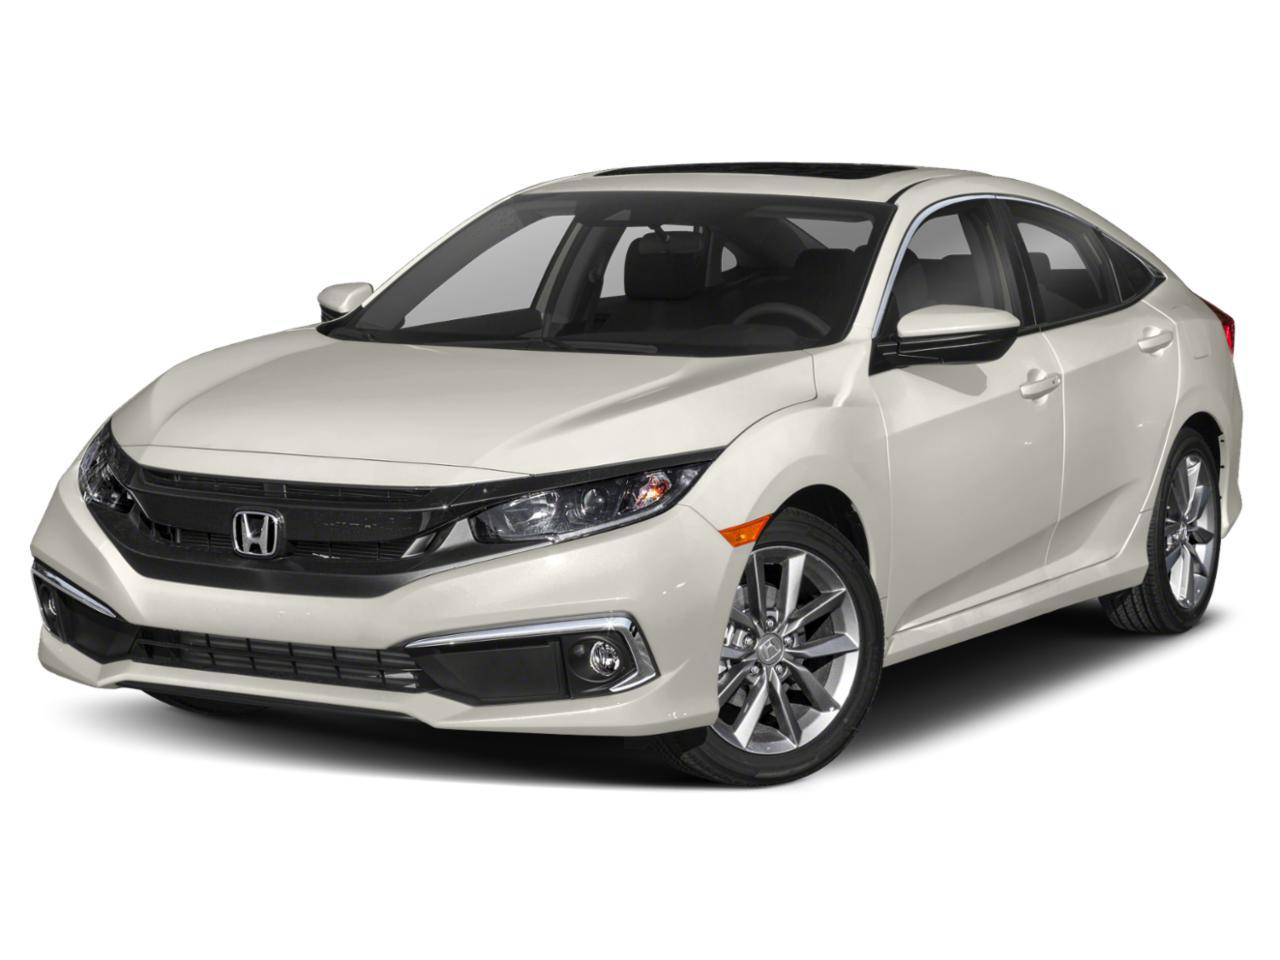 2021 Honda Civic Sedan Vehicle Photo in San Antonio, TX 78238